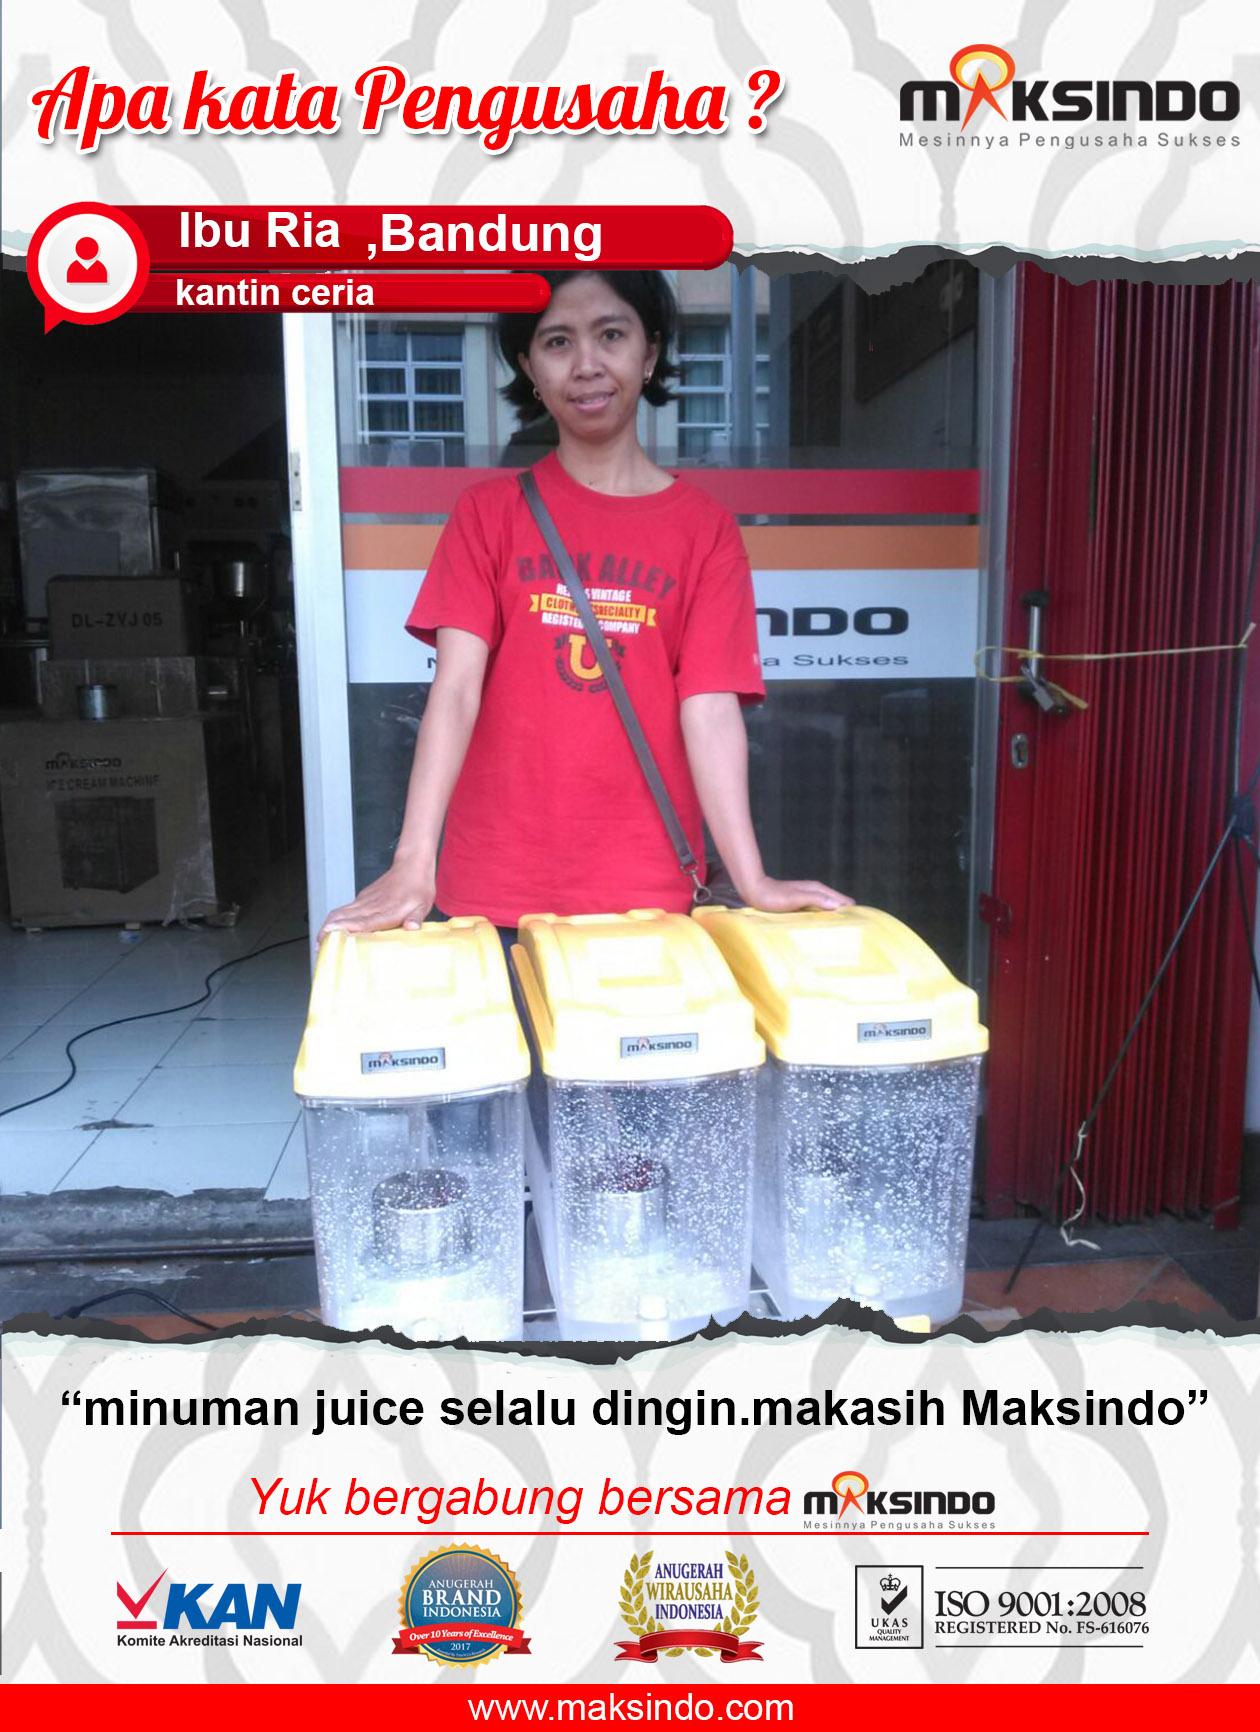 Kantin Ceria : Mesin Juice Dispenser Membuat Minuman Jus Selalu Dingin